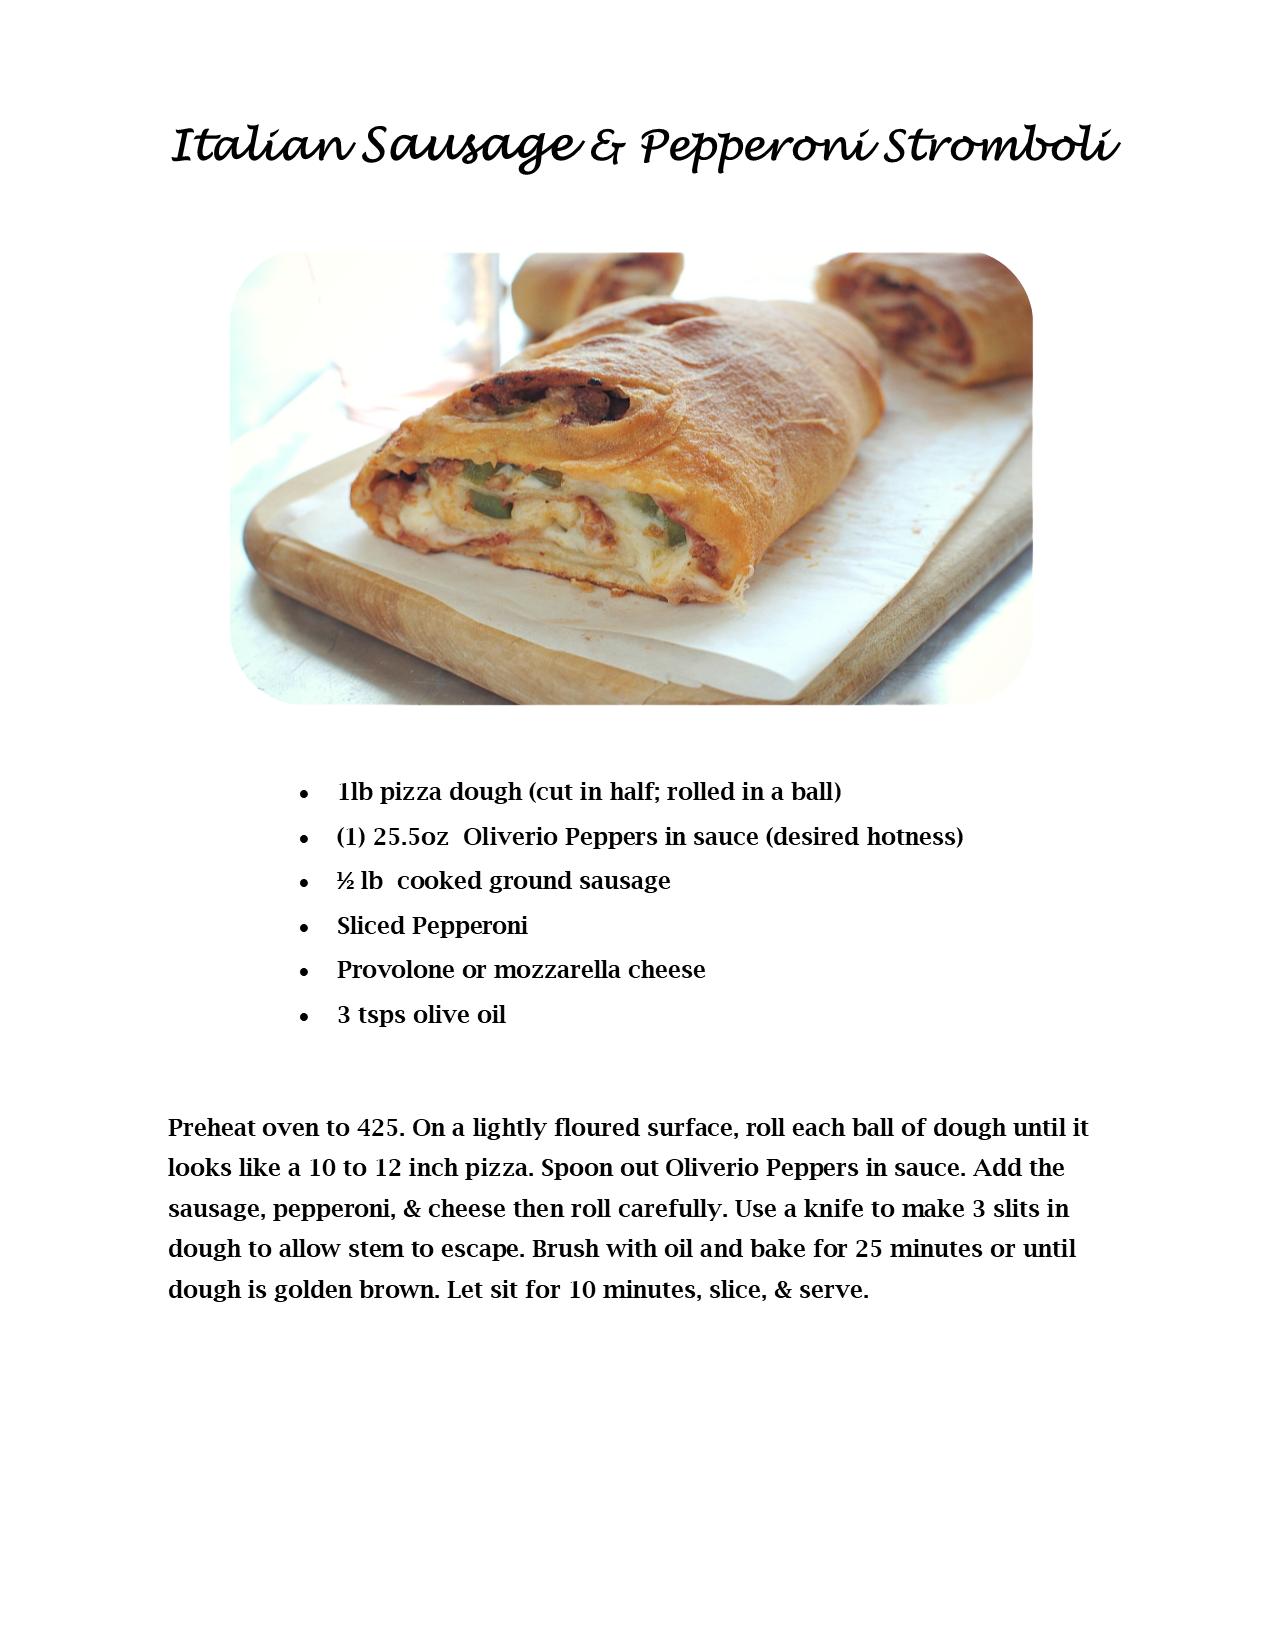 Italian Sausage & Pepperoni Stromboli